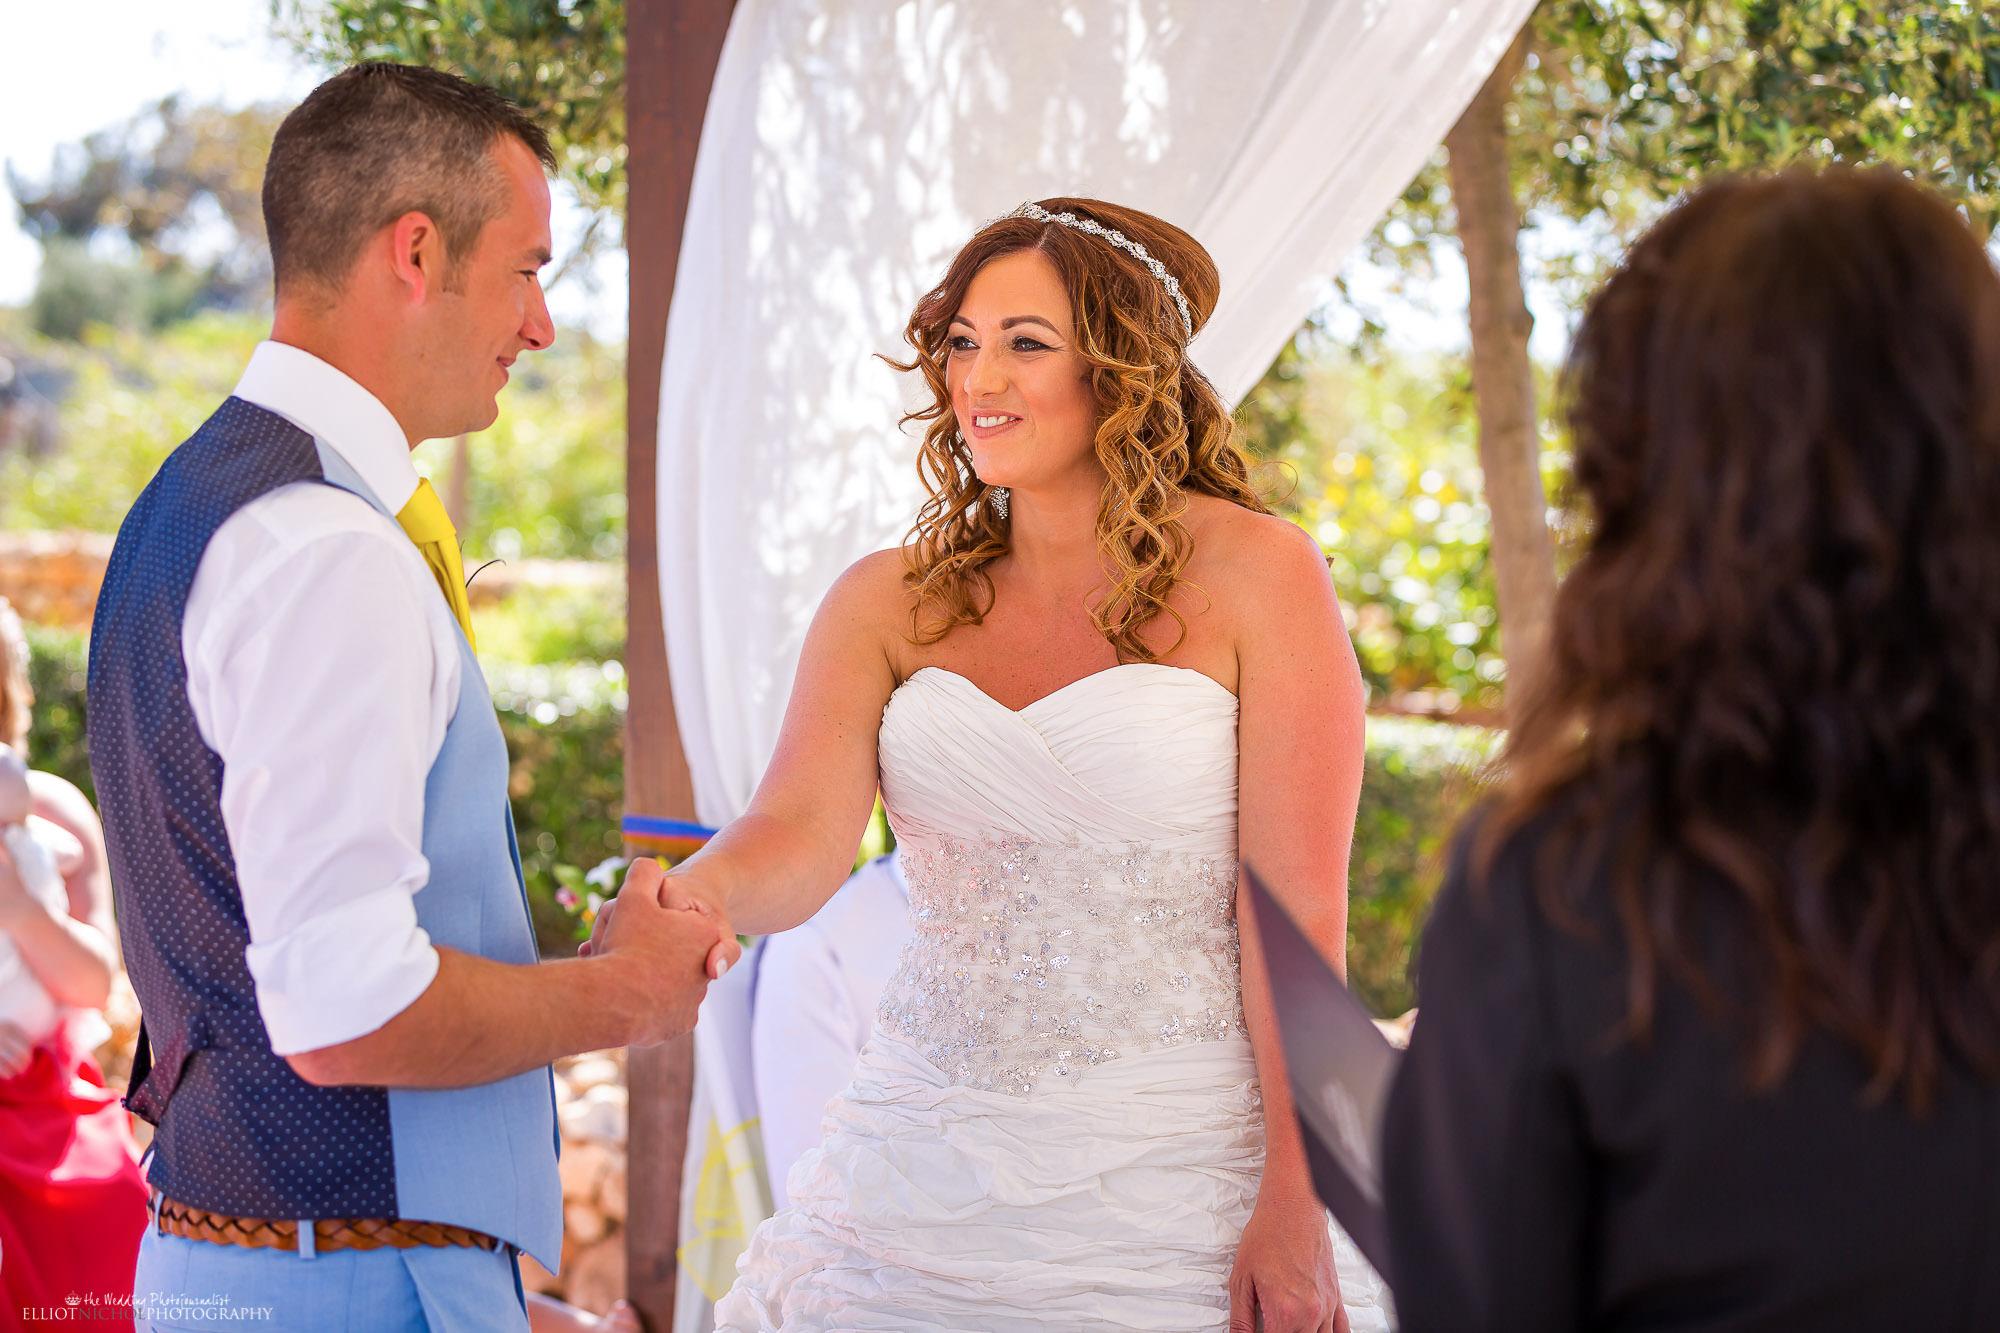 wedding-vows-ceremony-bride-groom-photography